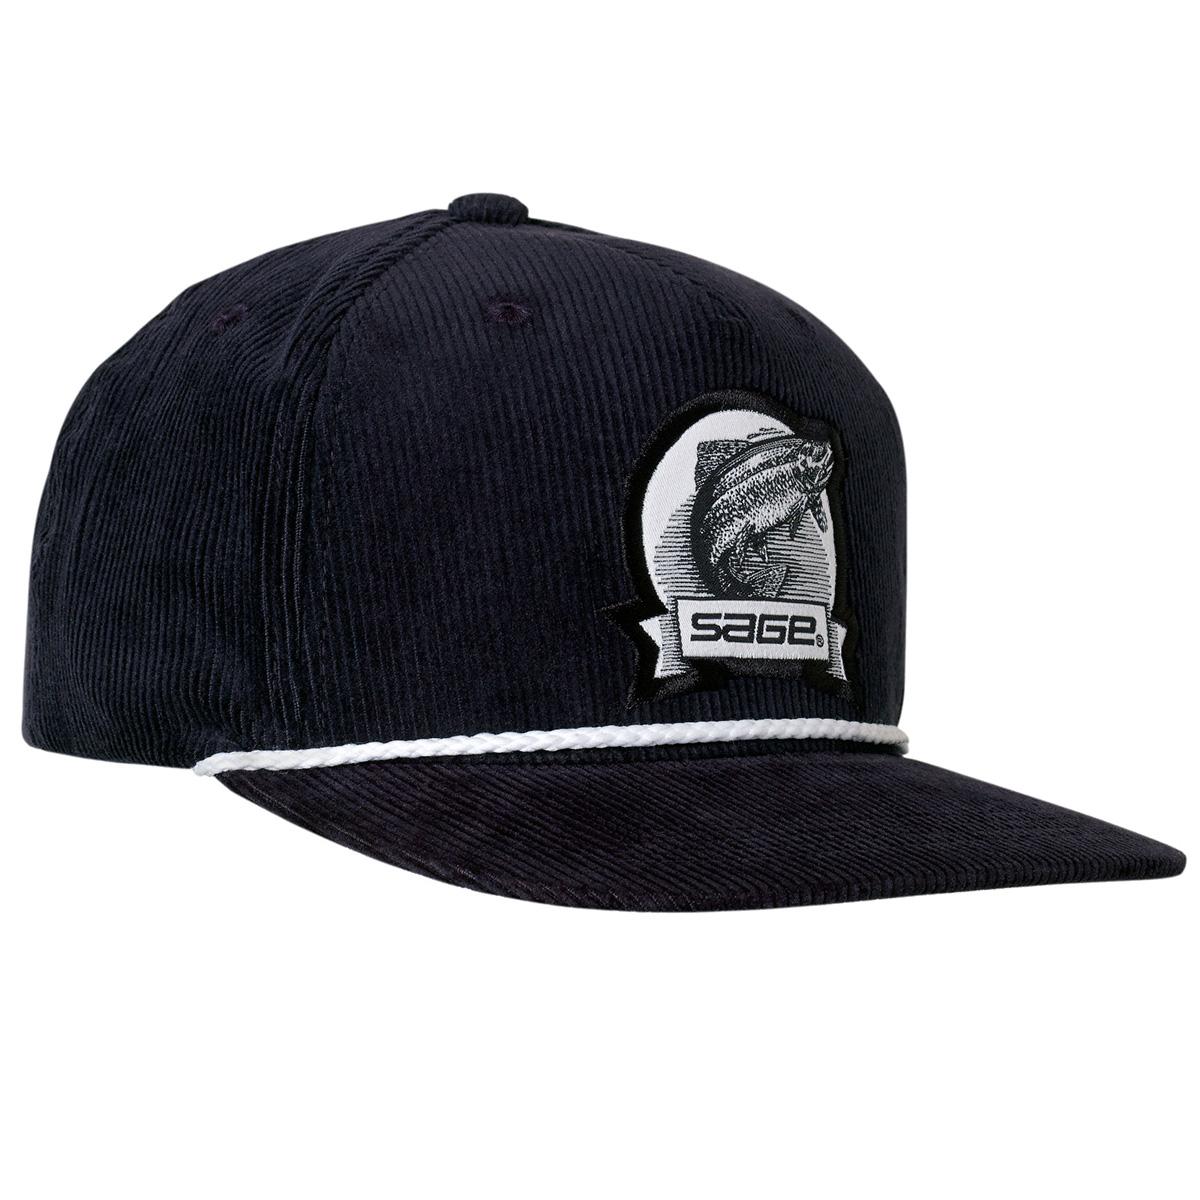 Sage heritage corduroy navy fishing caps taimen for Sage fly fishing hat